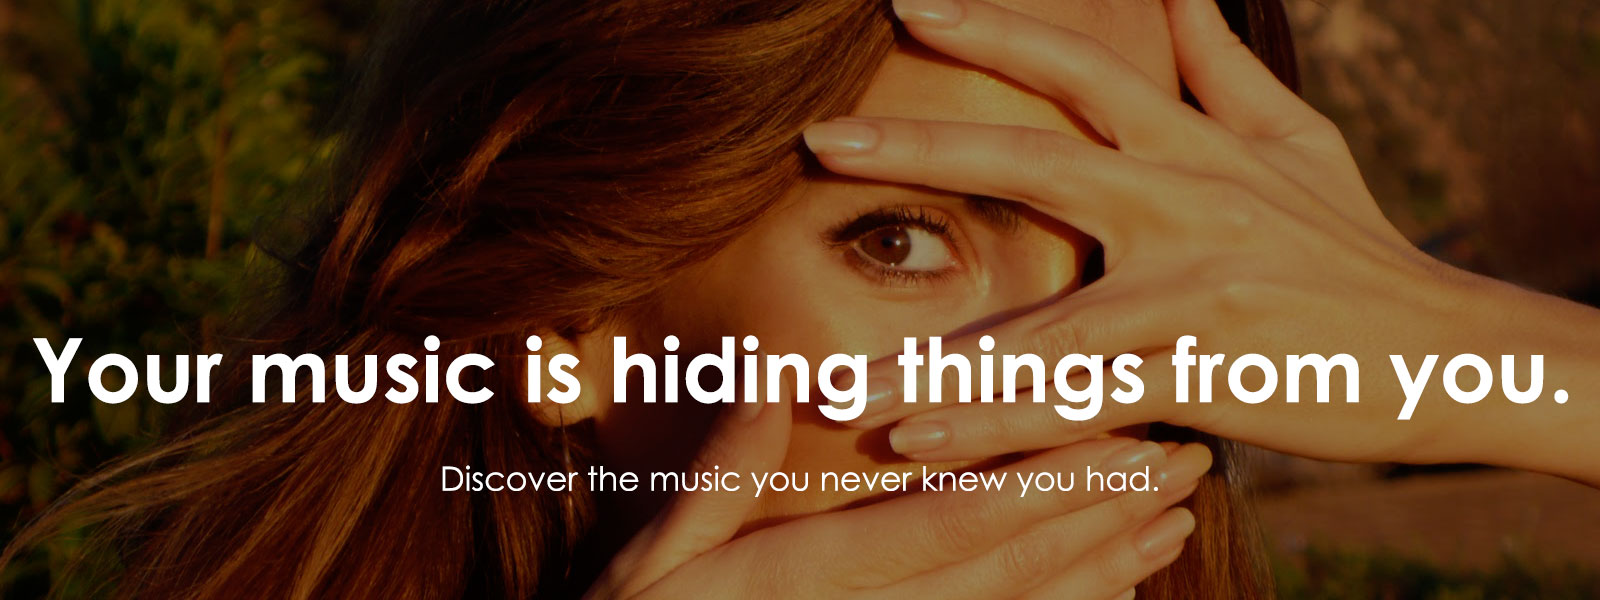 HiddenSongs.com